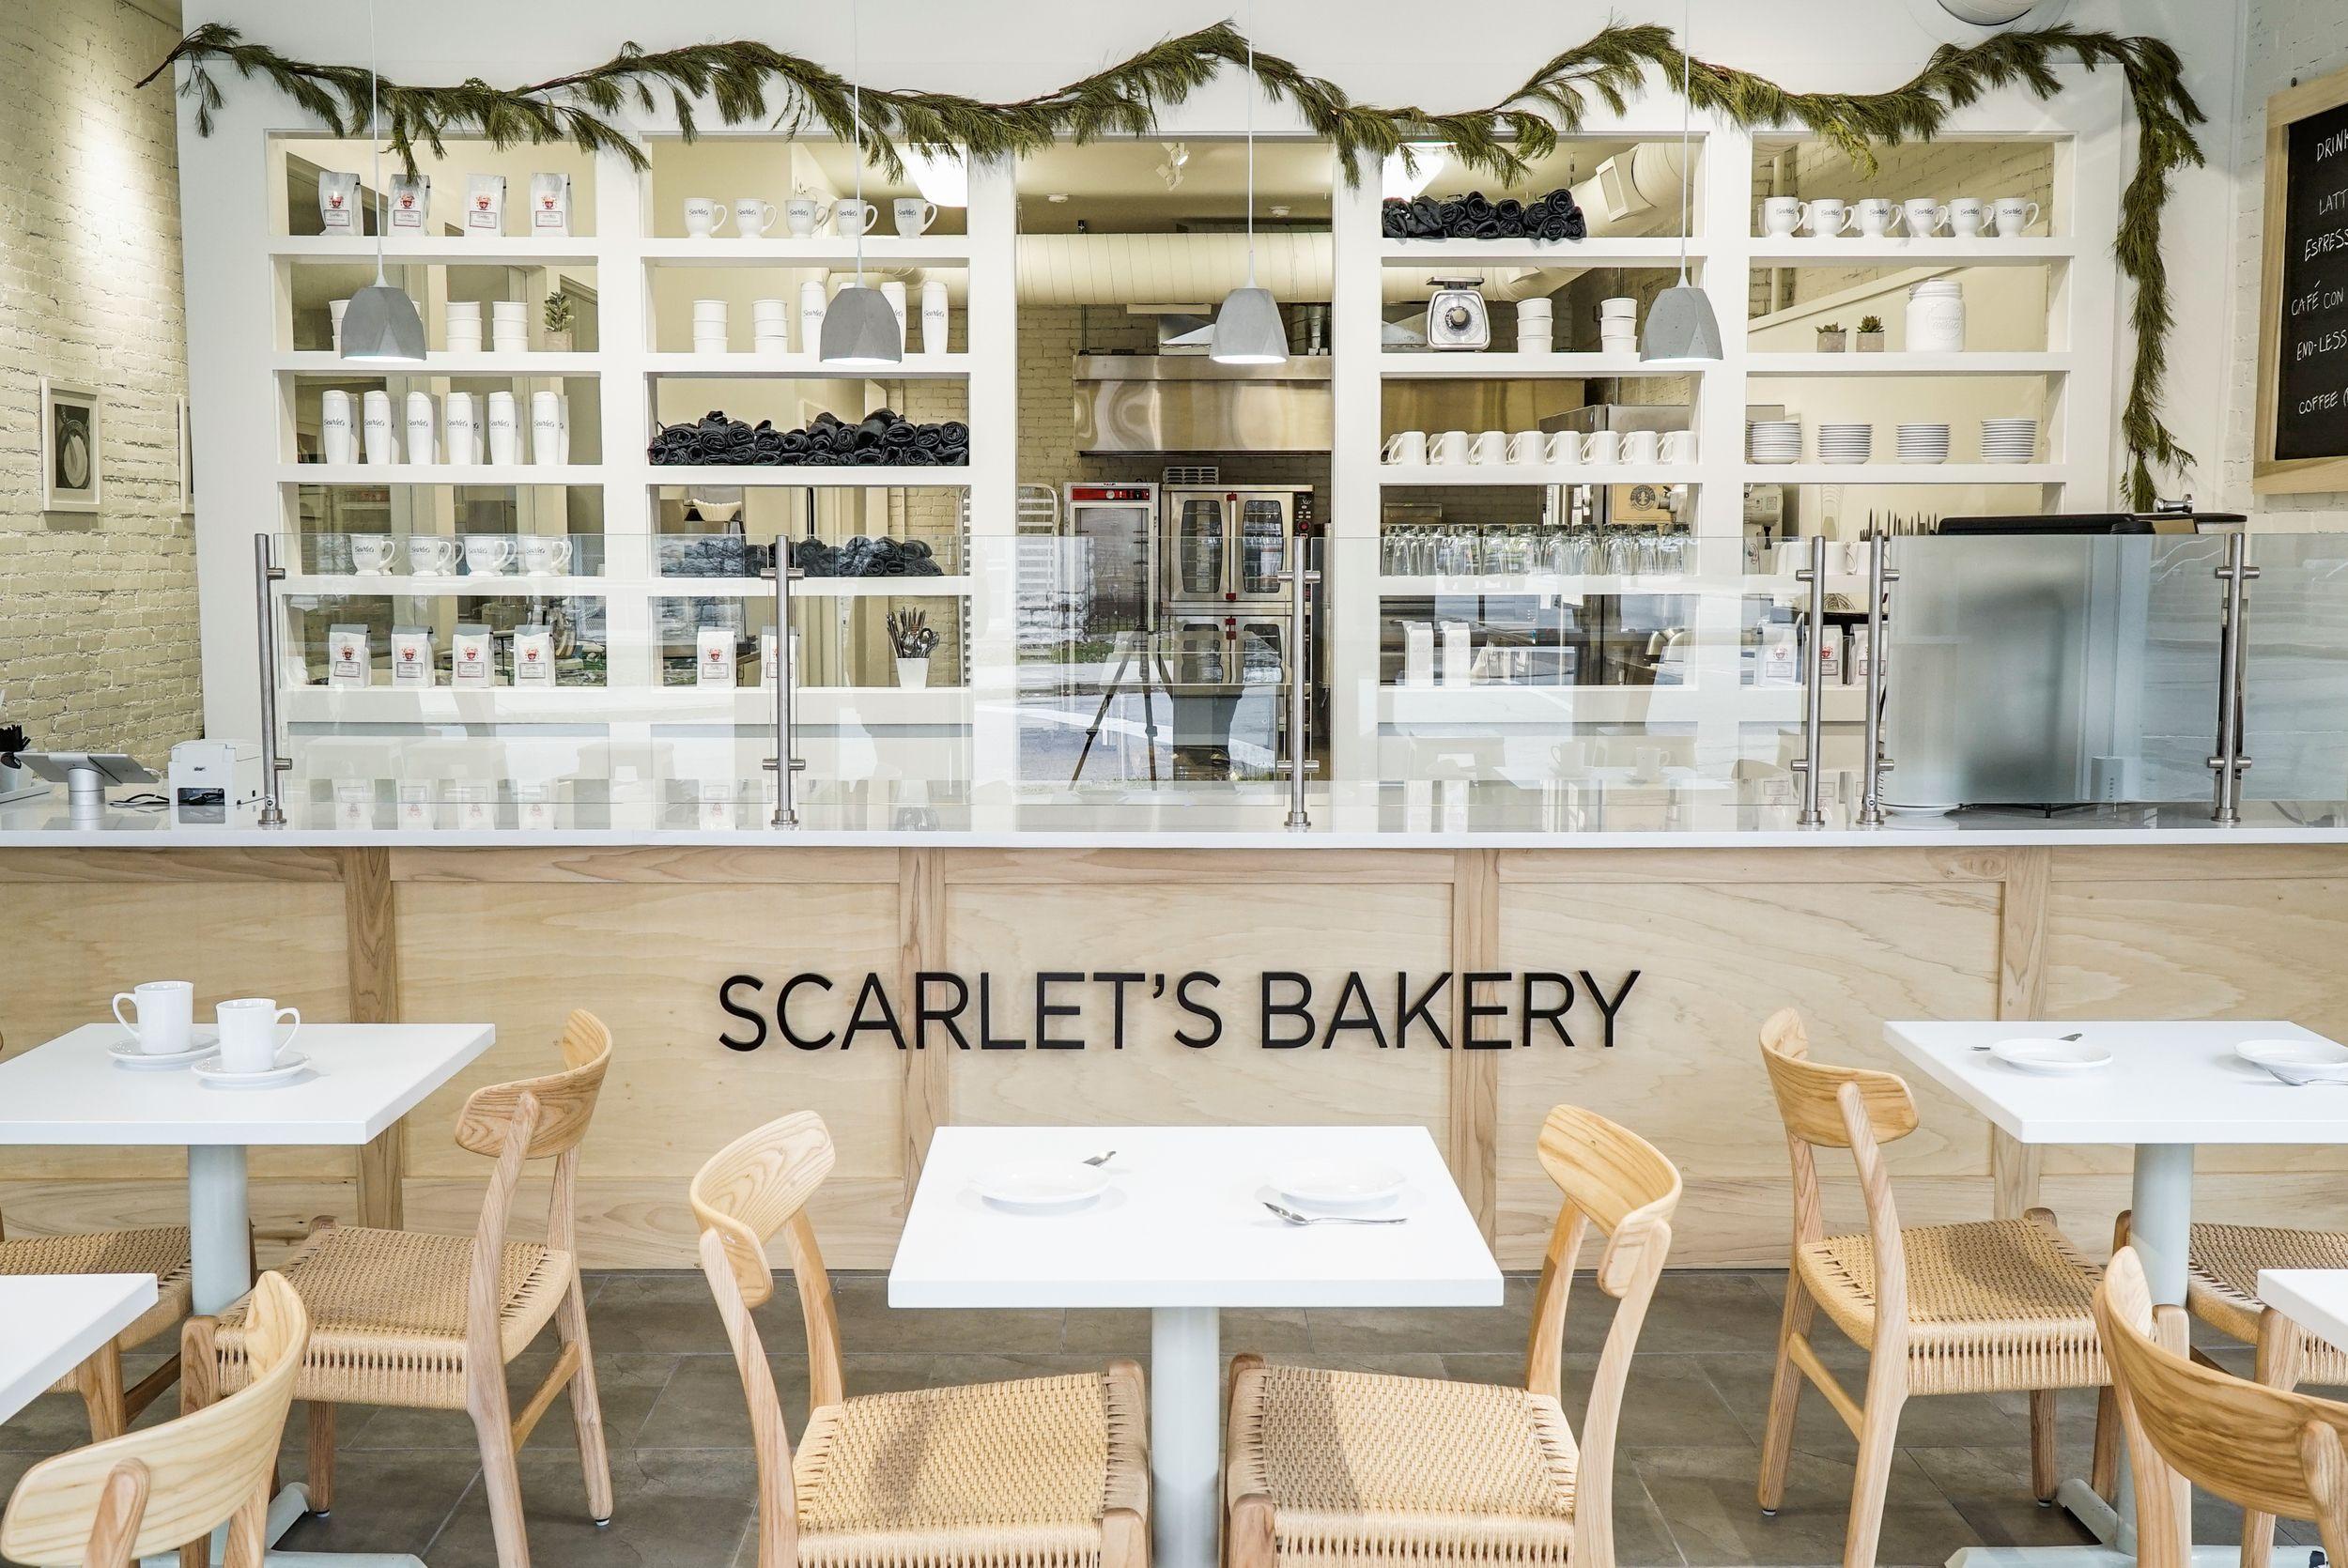 Scarletu0027s Bakery Interior Design By Knot U0026 Company, LLC; Via KNOT And  COMPANY ( · Bakery Interior DesignLouisville KentuckyScarletBakeriesKnots